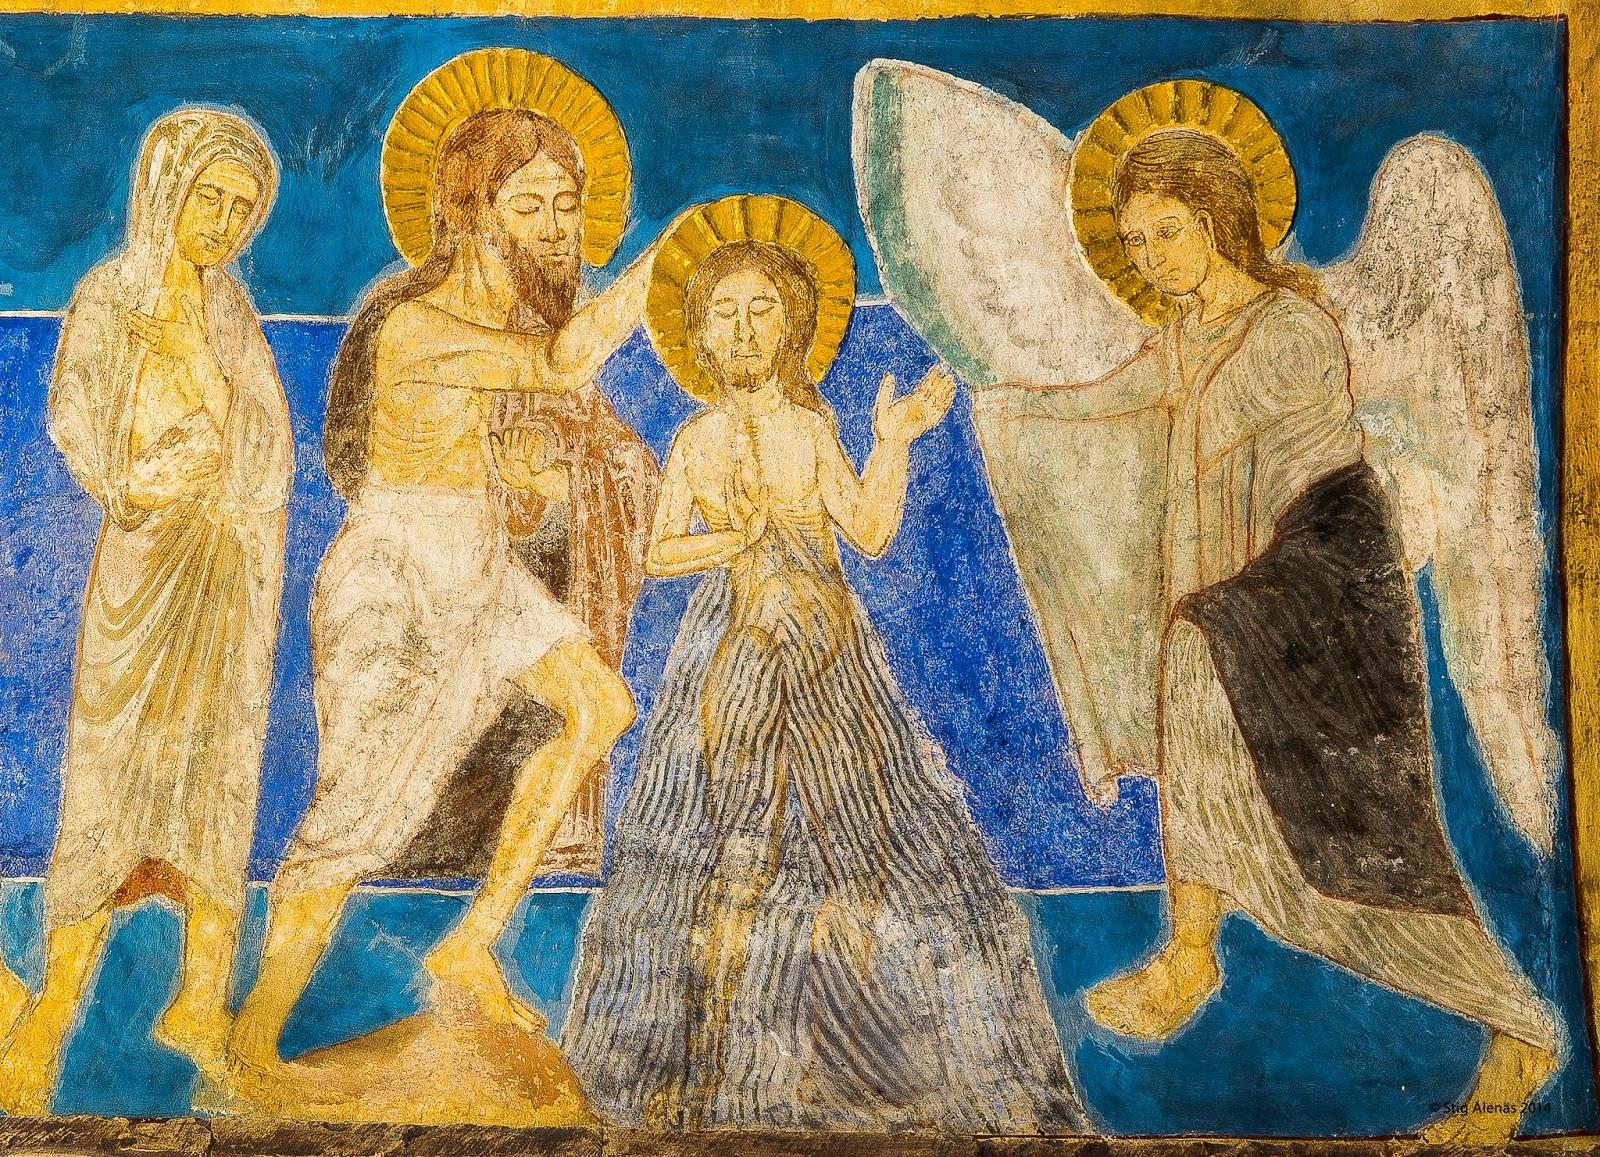 jordan, medieval, mural, john, saint, jesus, editorial, sweden, church, wall, bible, baptist, christ, painting, ultramarine, fresco, baptism, religion, art, byzantine, angle, christianity, romanesque, bjaresjo